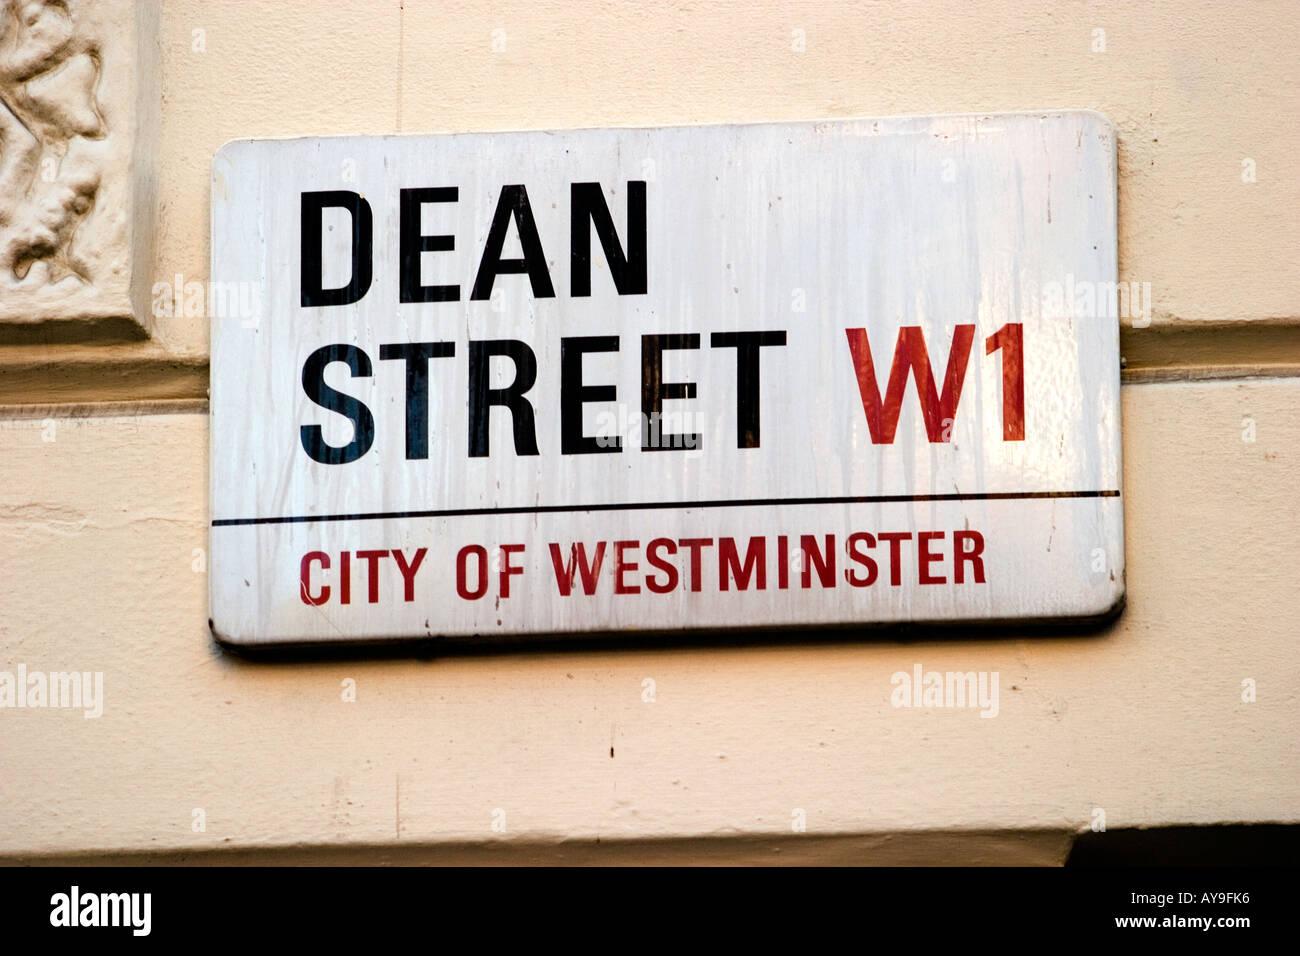 dean street street sign street london - Stock Image